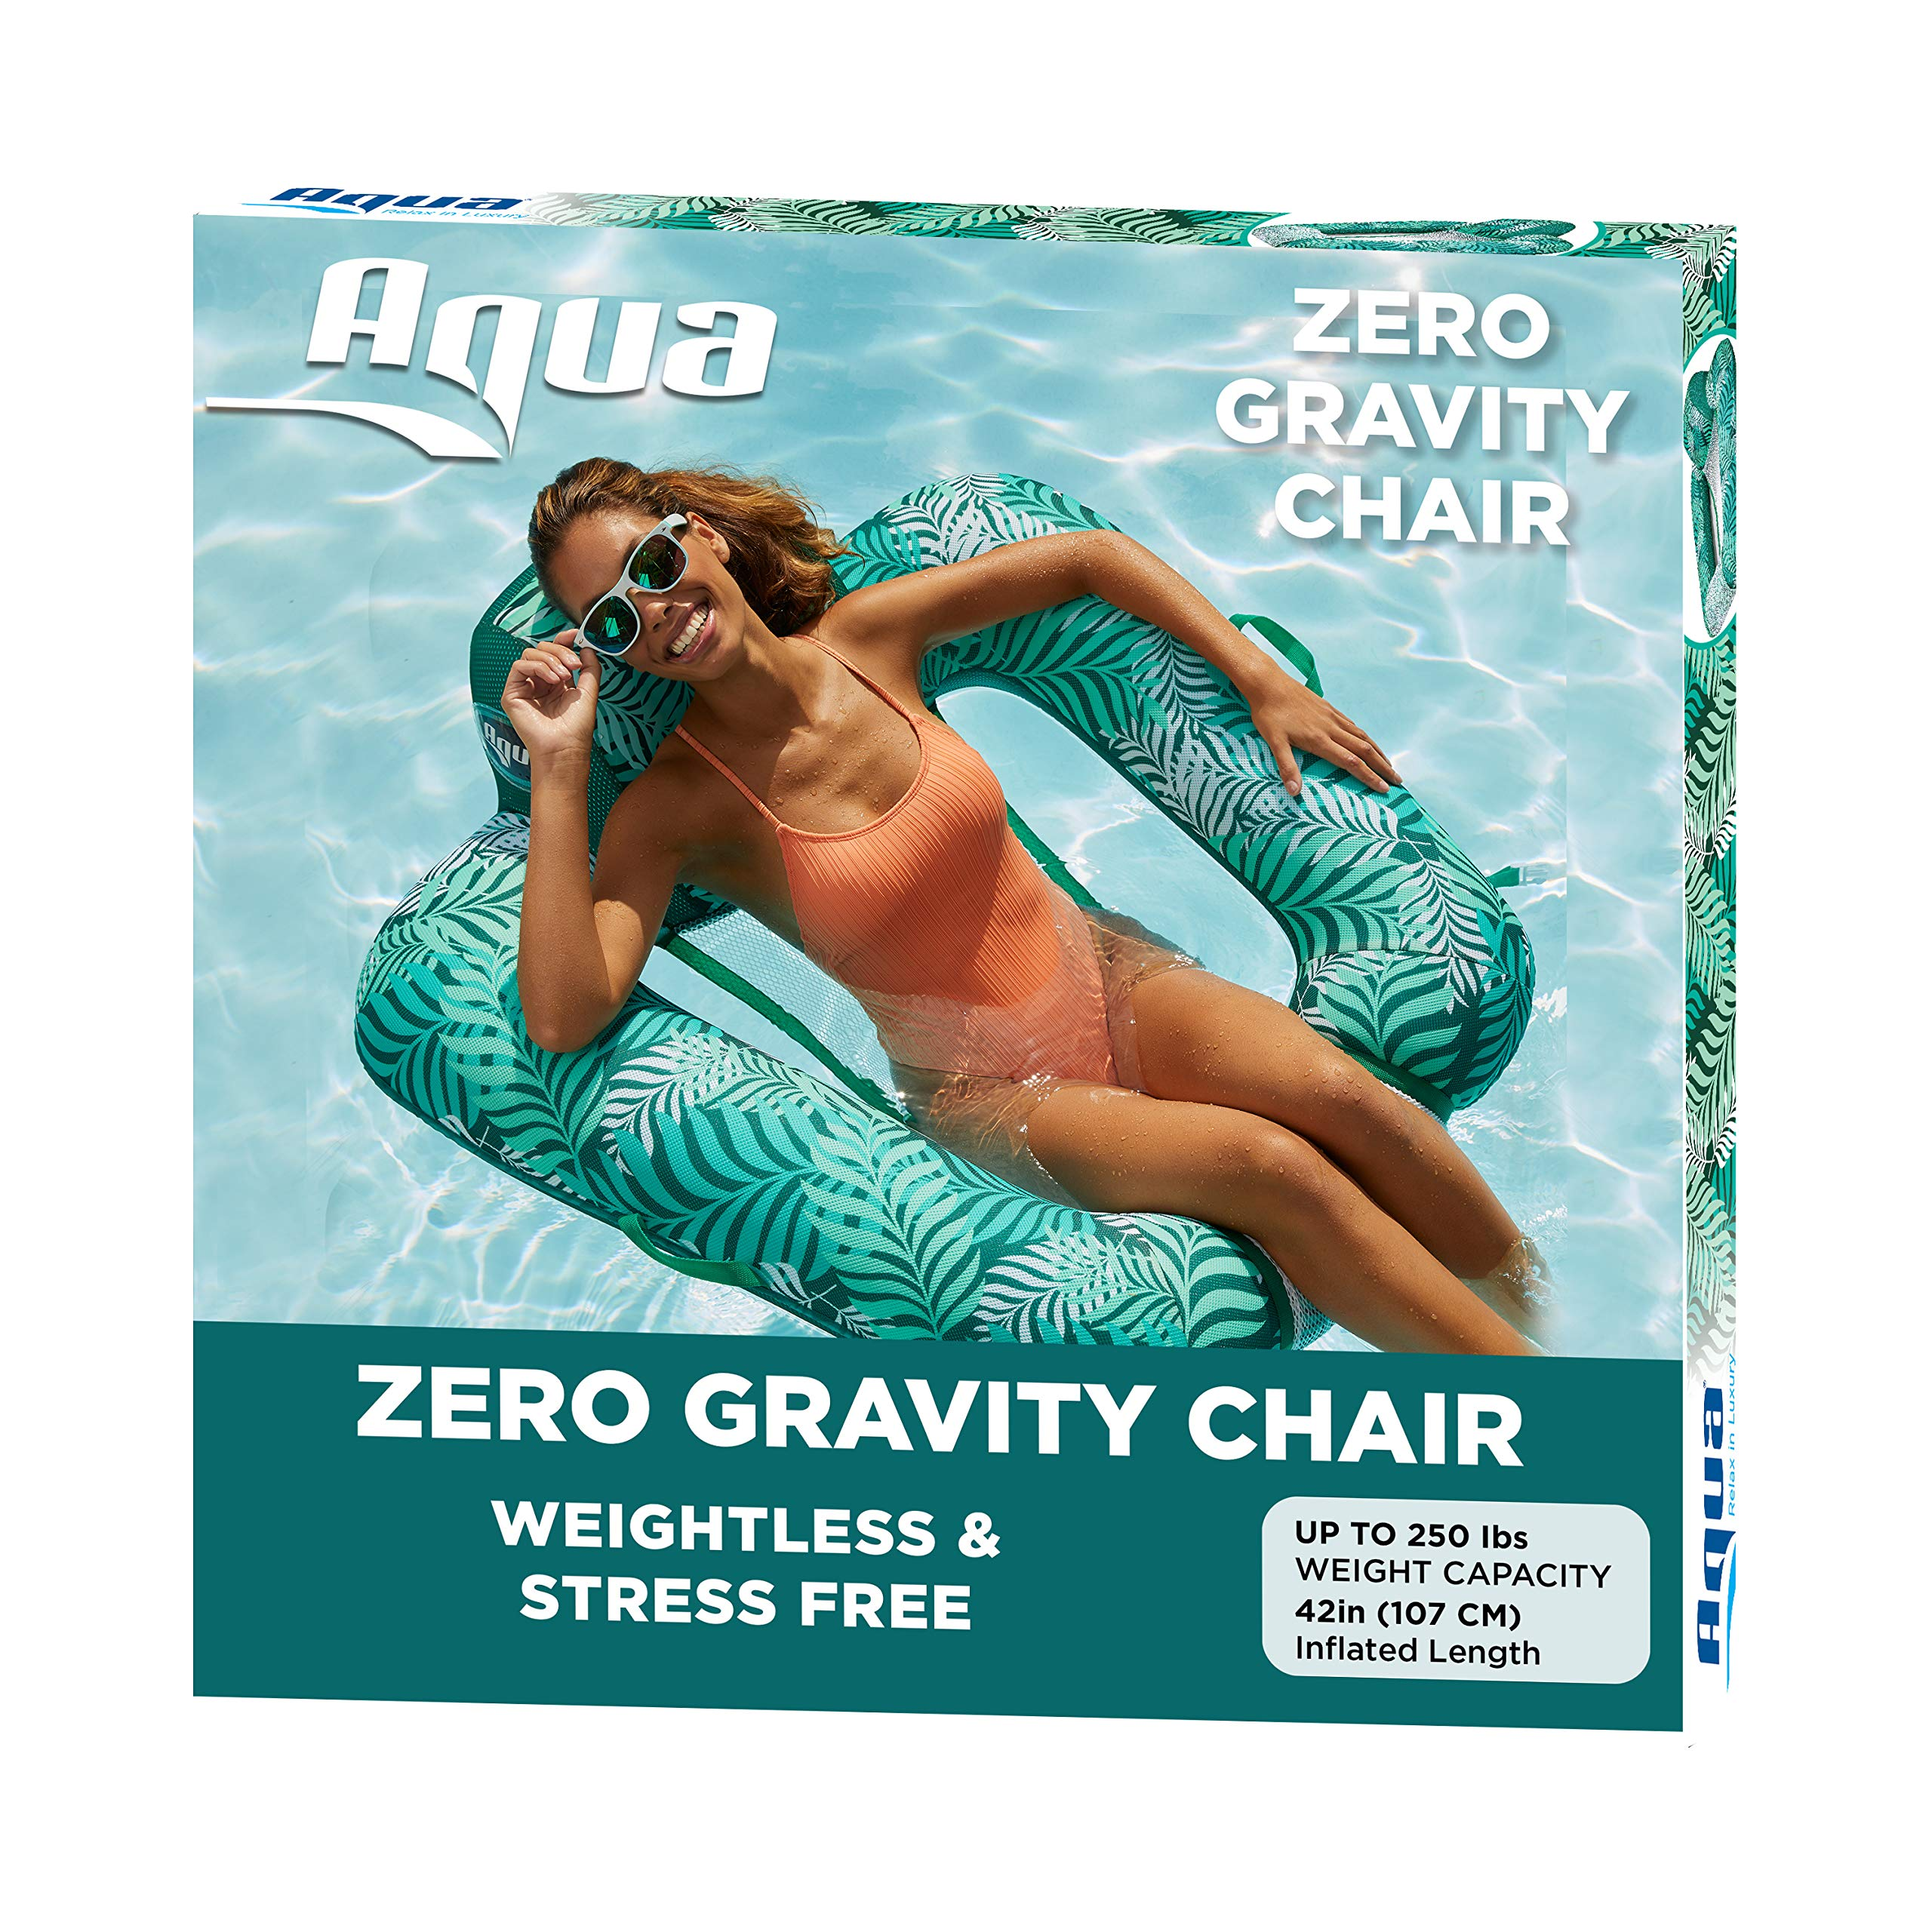 Aqua Zero Gravity Pool Chair Lounge Inflatable Pool Chair Adult Pool Float Heavy Duty Teal Fern Blue Teal - Zero G Pool Chair (AZL17290TL)